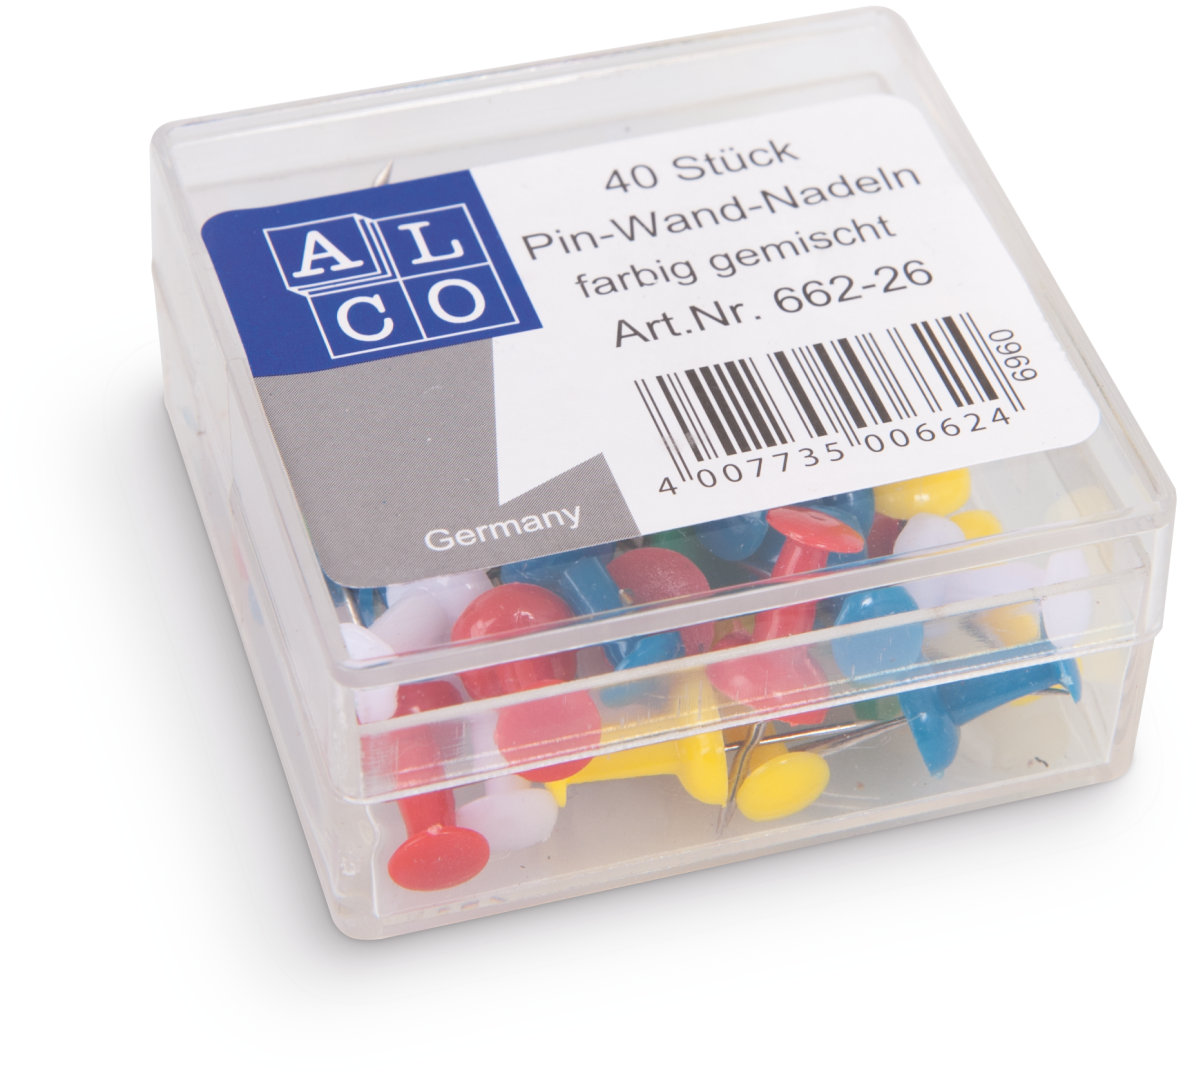 Alco pushpins assorti kleur